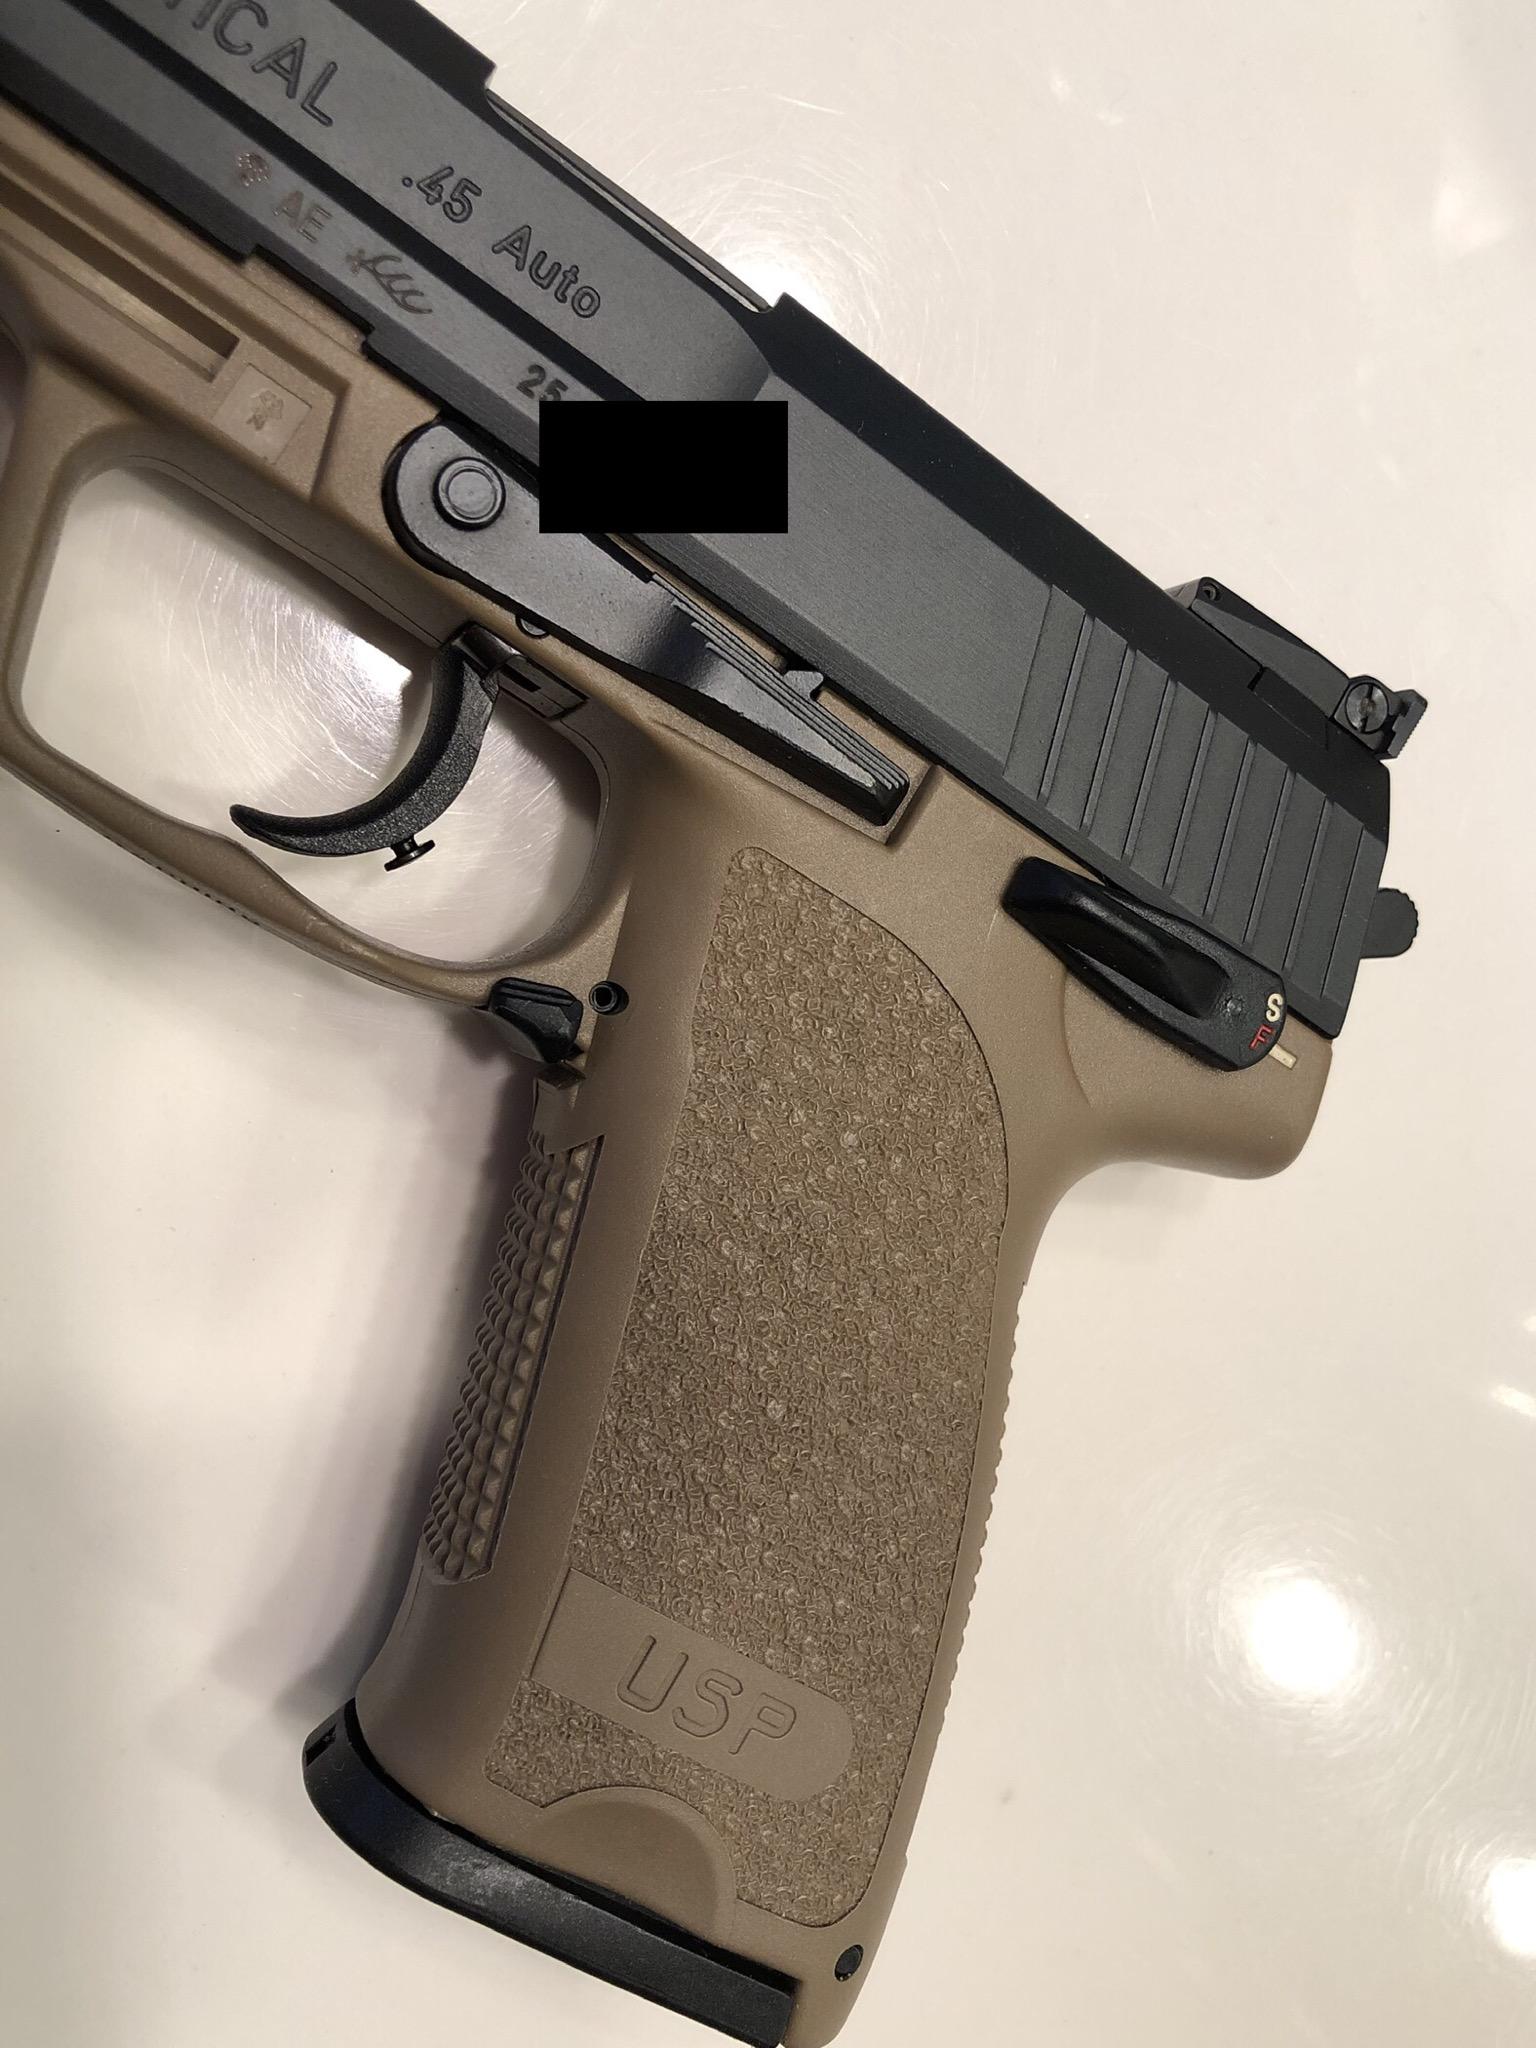 SOLD: HK USP .45 Tan Tactical (FDE)-21b63648-edf2-4bfb-950a-e5904017f0a1.jpeg